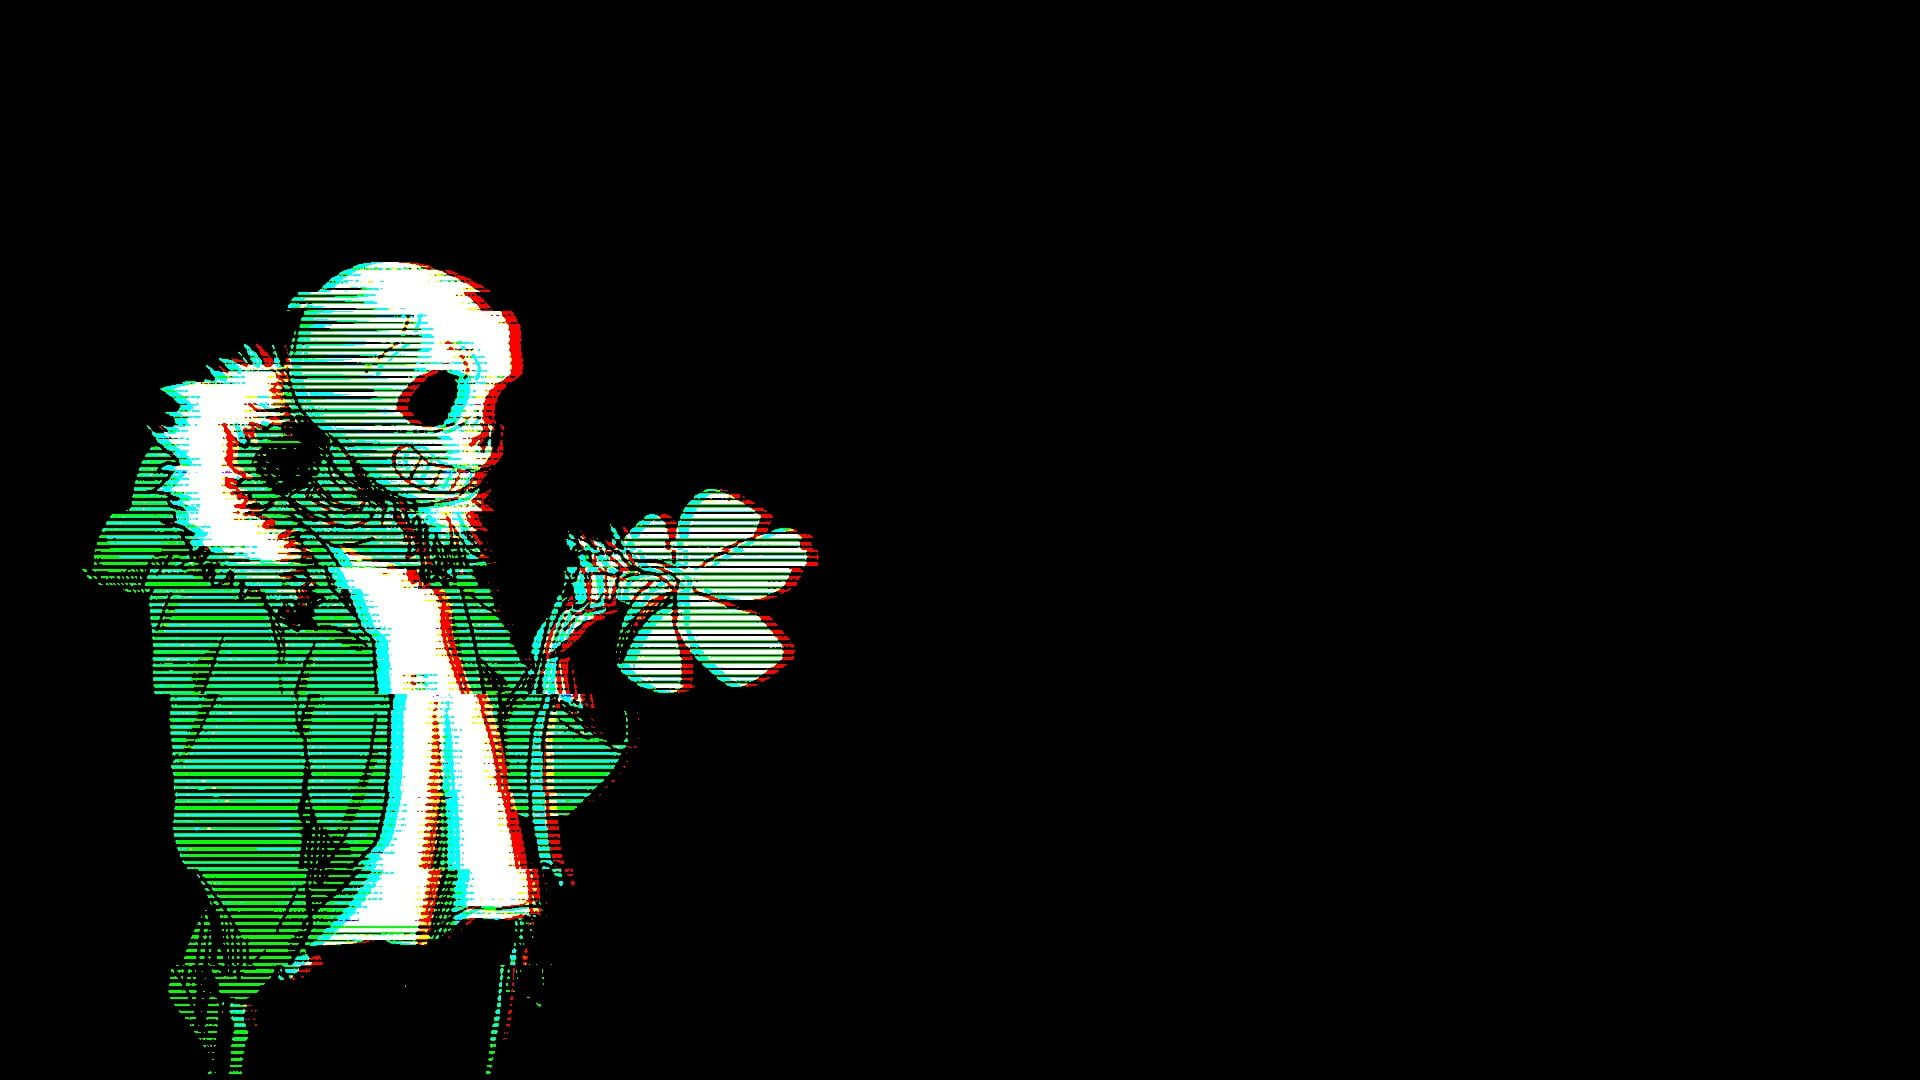 skeleton with green jacket wallpaper Undertale Sans